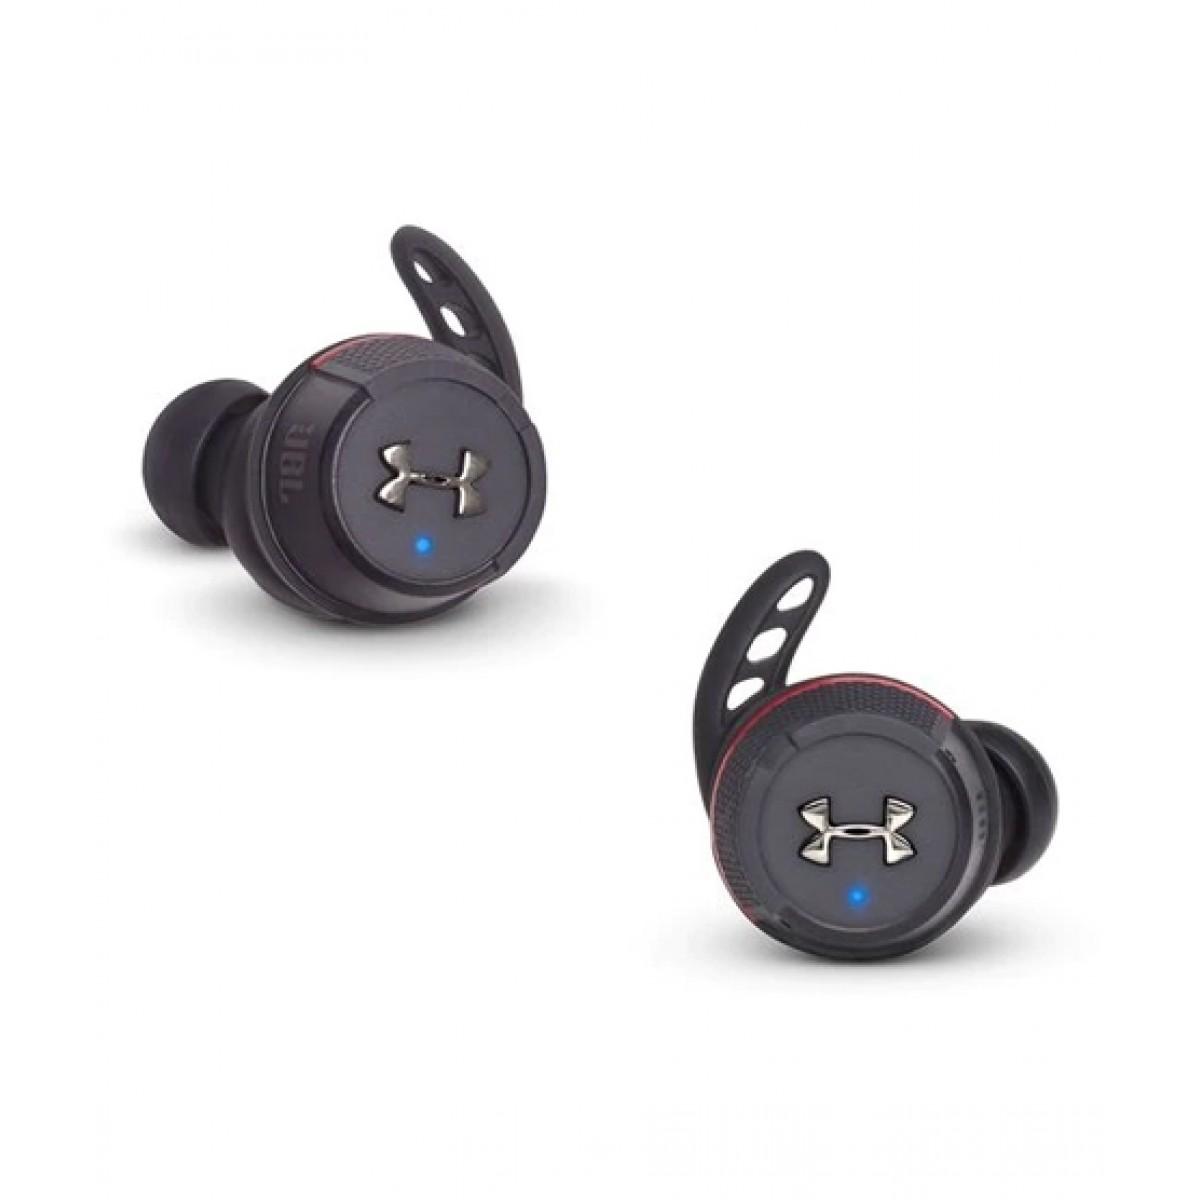 JBL Under Armour True Wireless Flash Earbuds Black